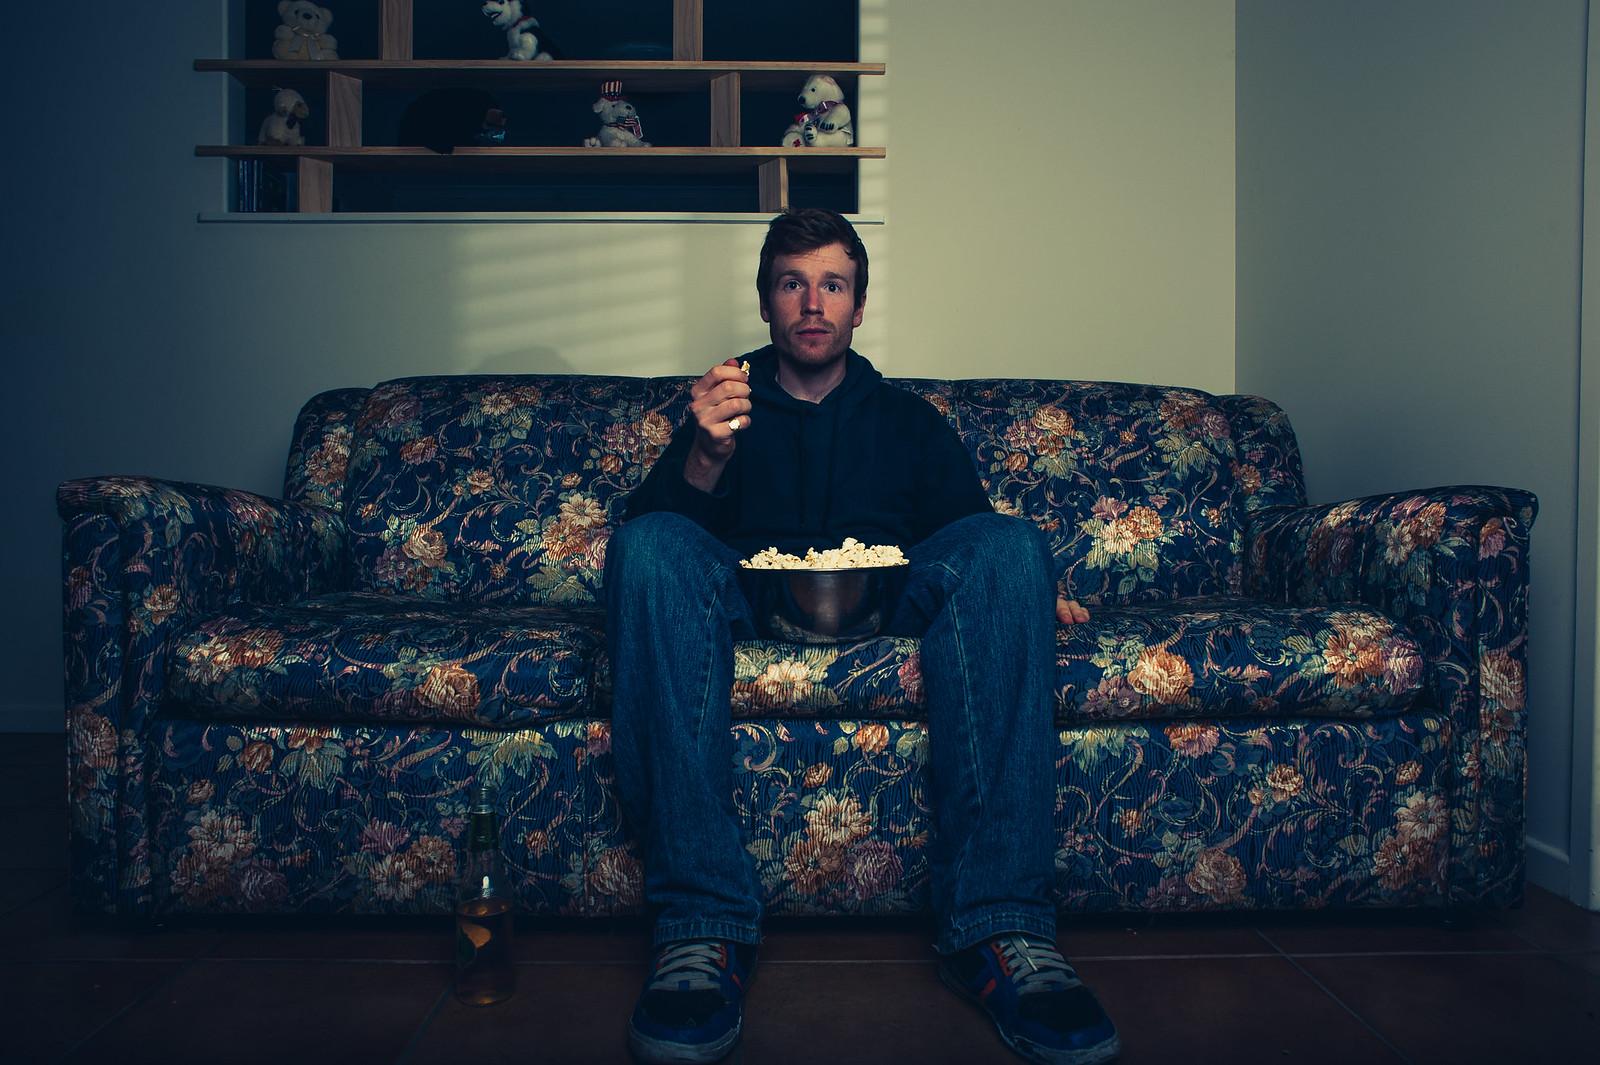 #175 Movies and Popcorn